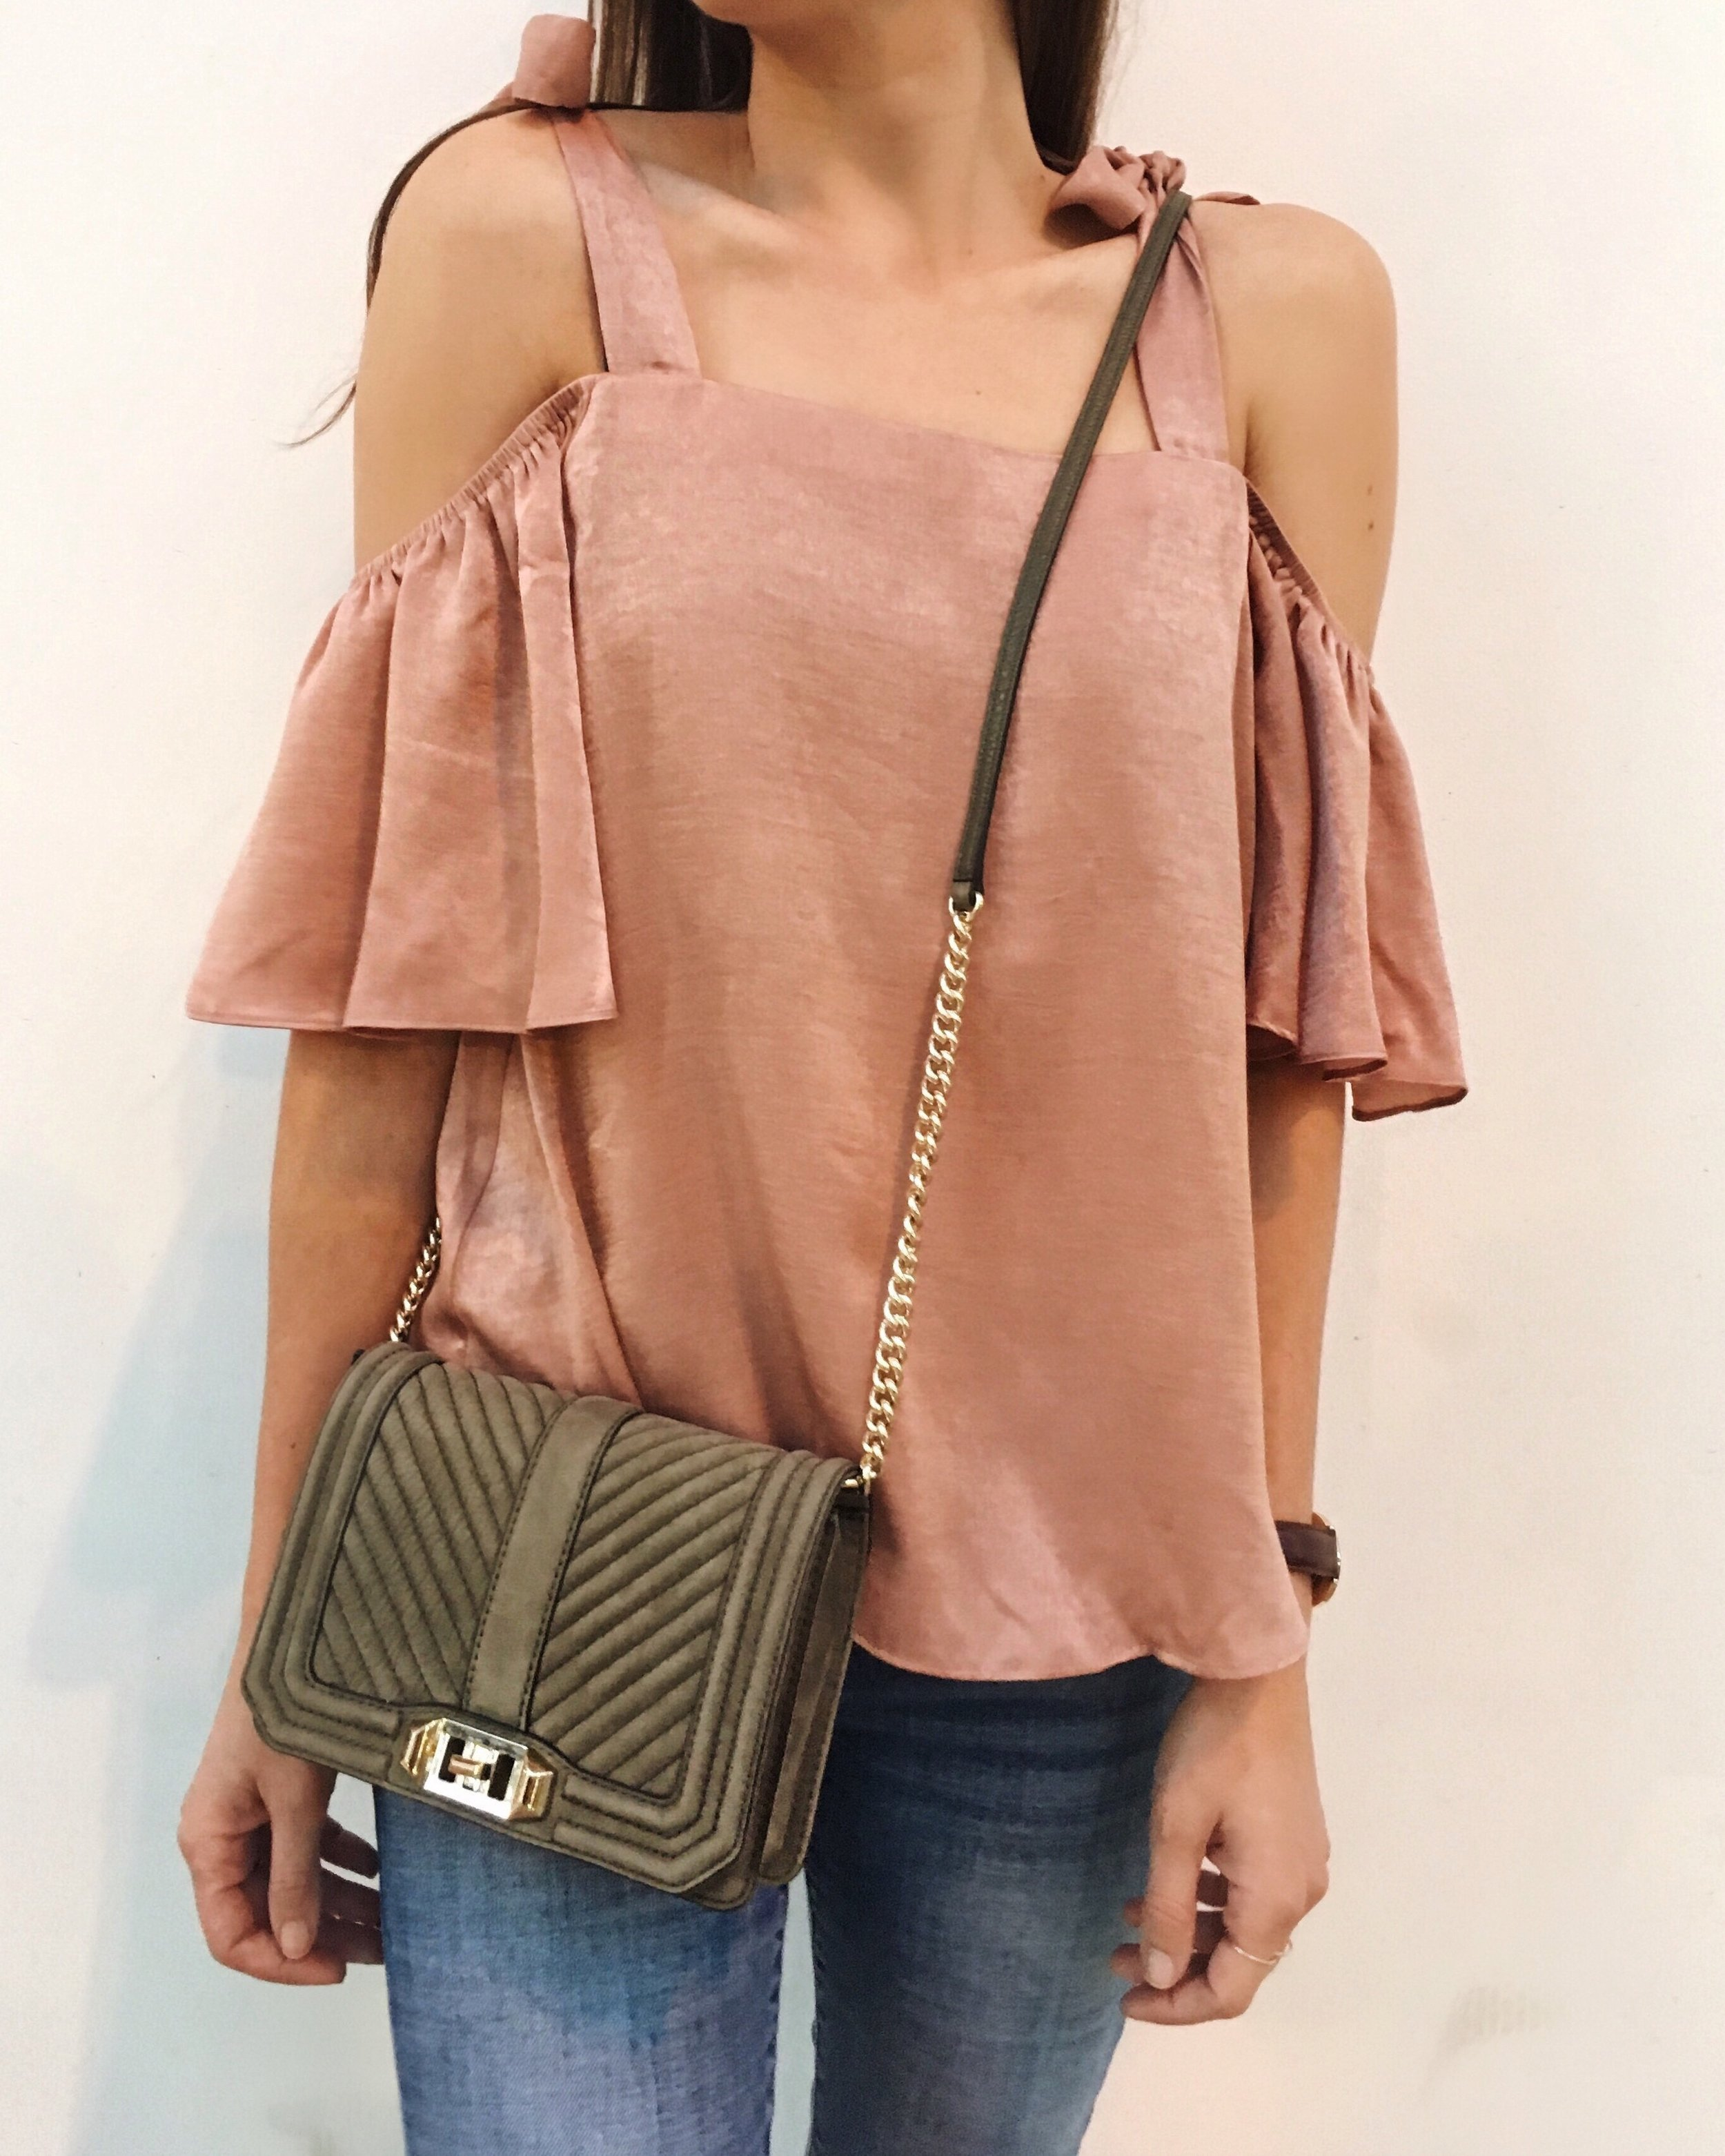 Nordstrom Top  |  Rebecca Minkoff Bag